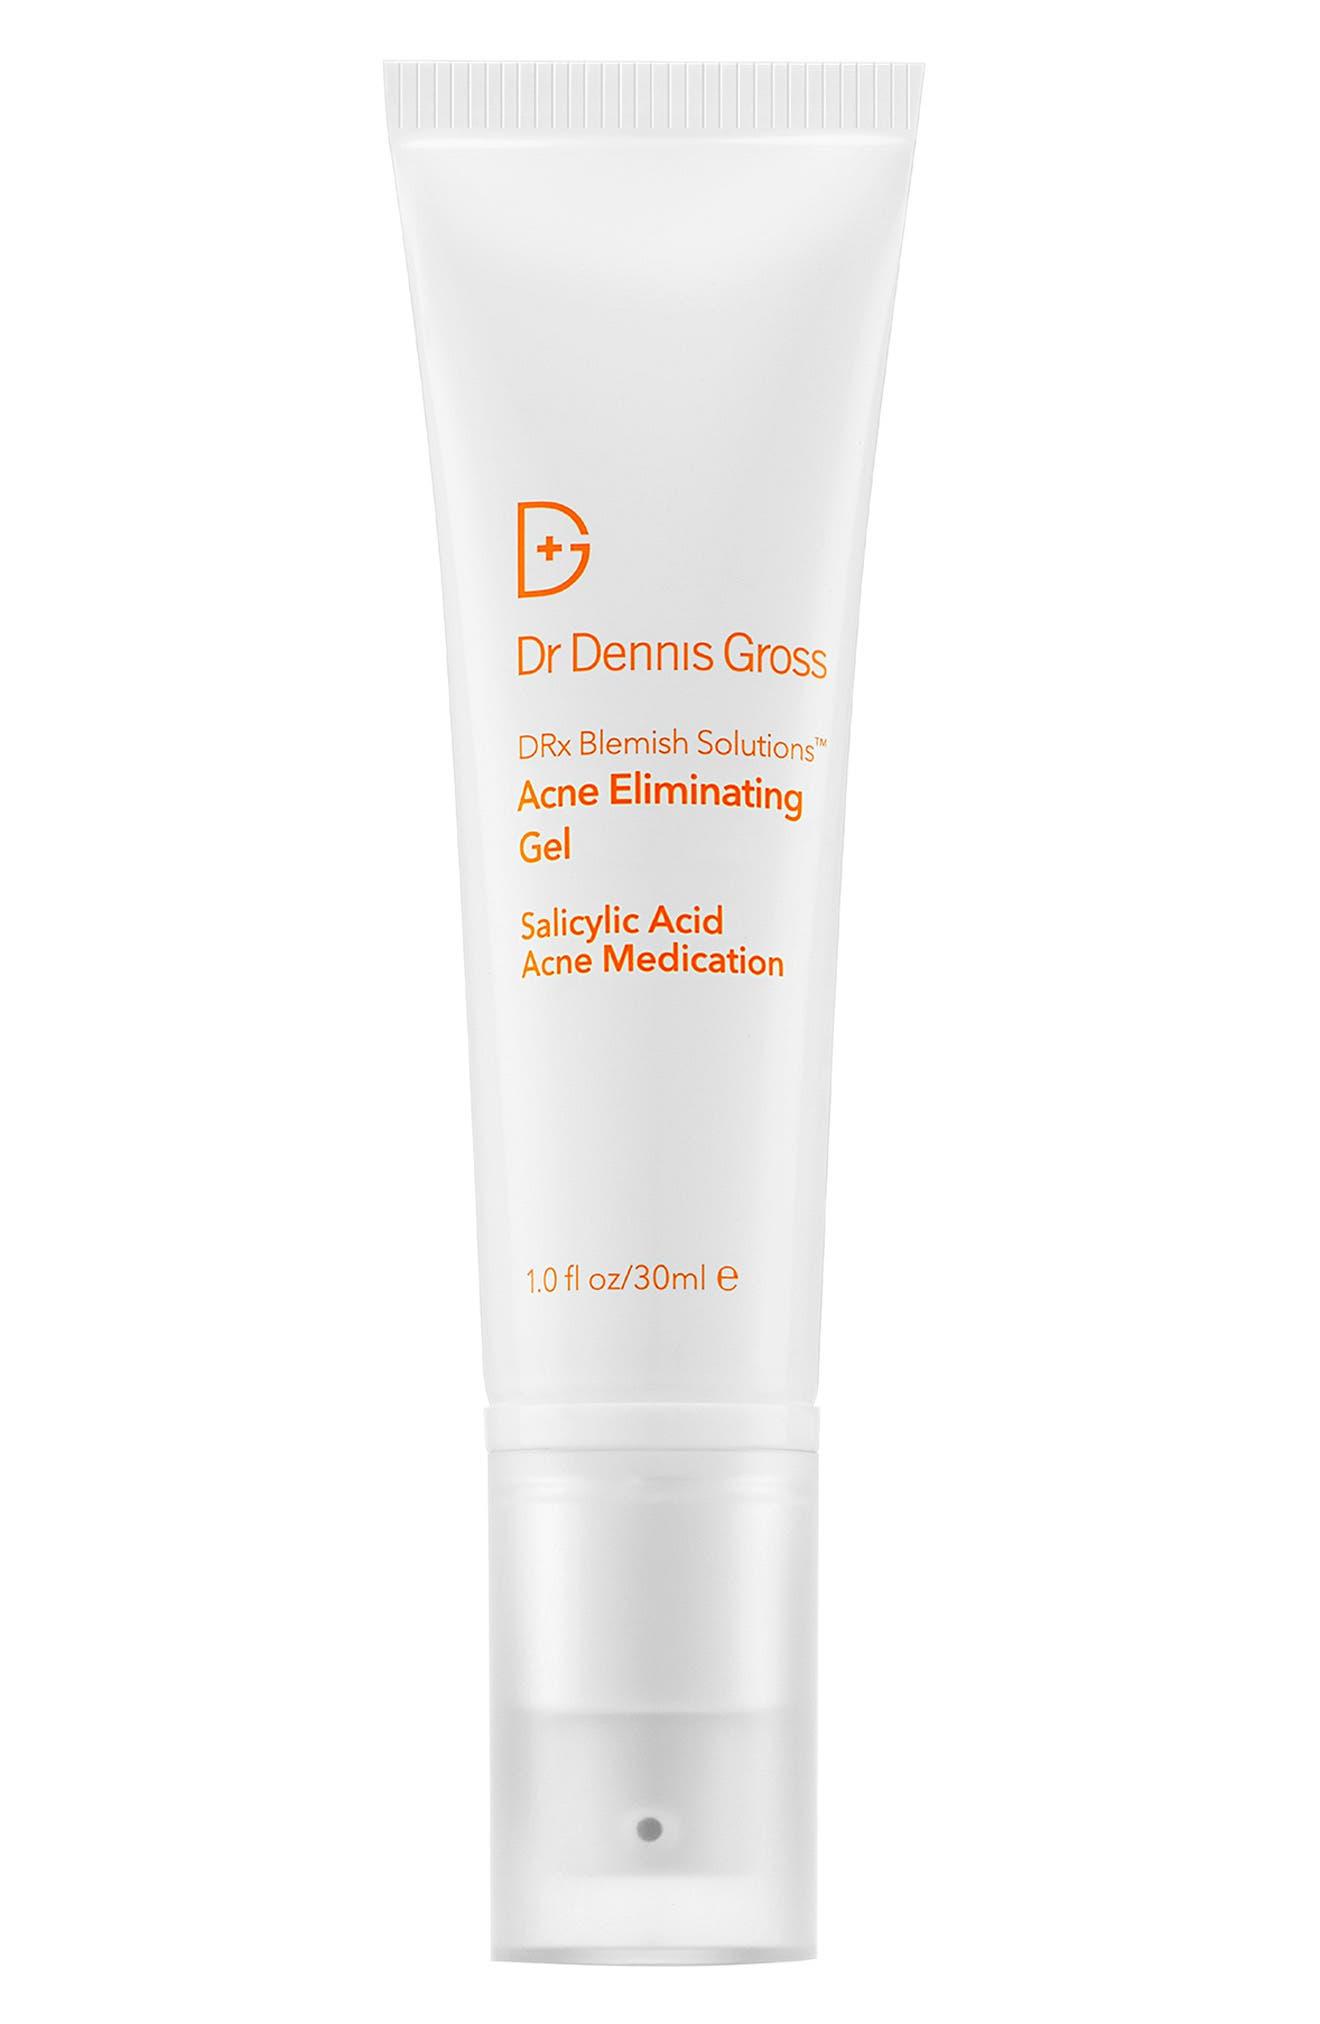 Skincare Drx Blemish Solutions(TM) Acne Elminating Gel